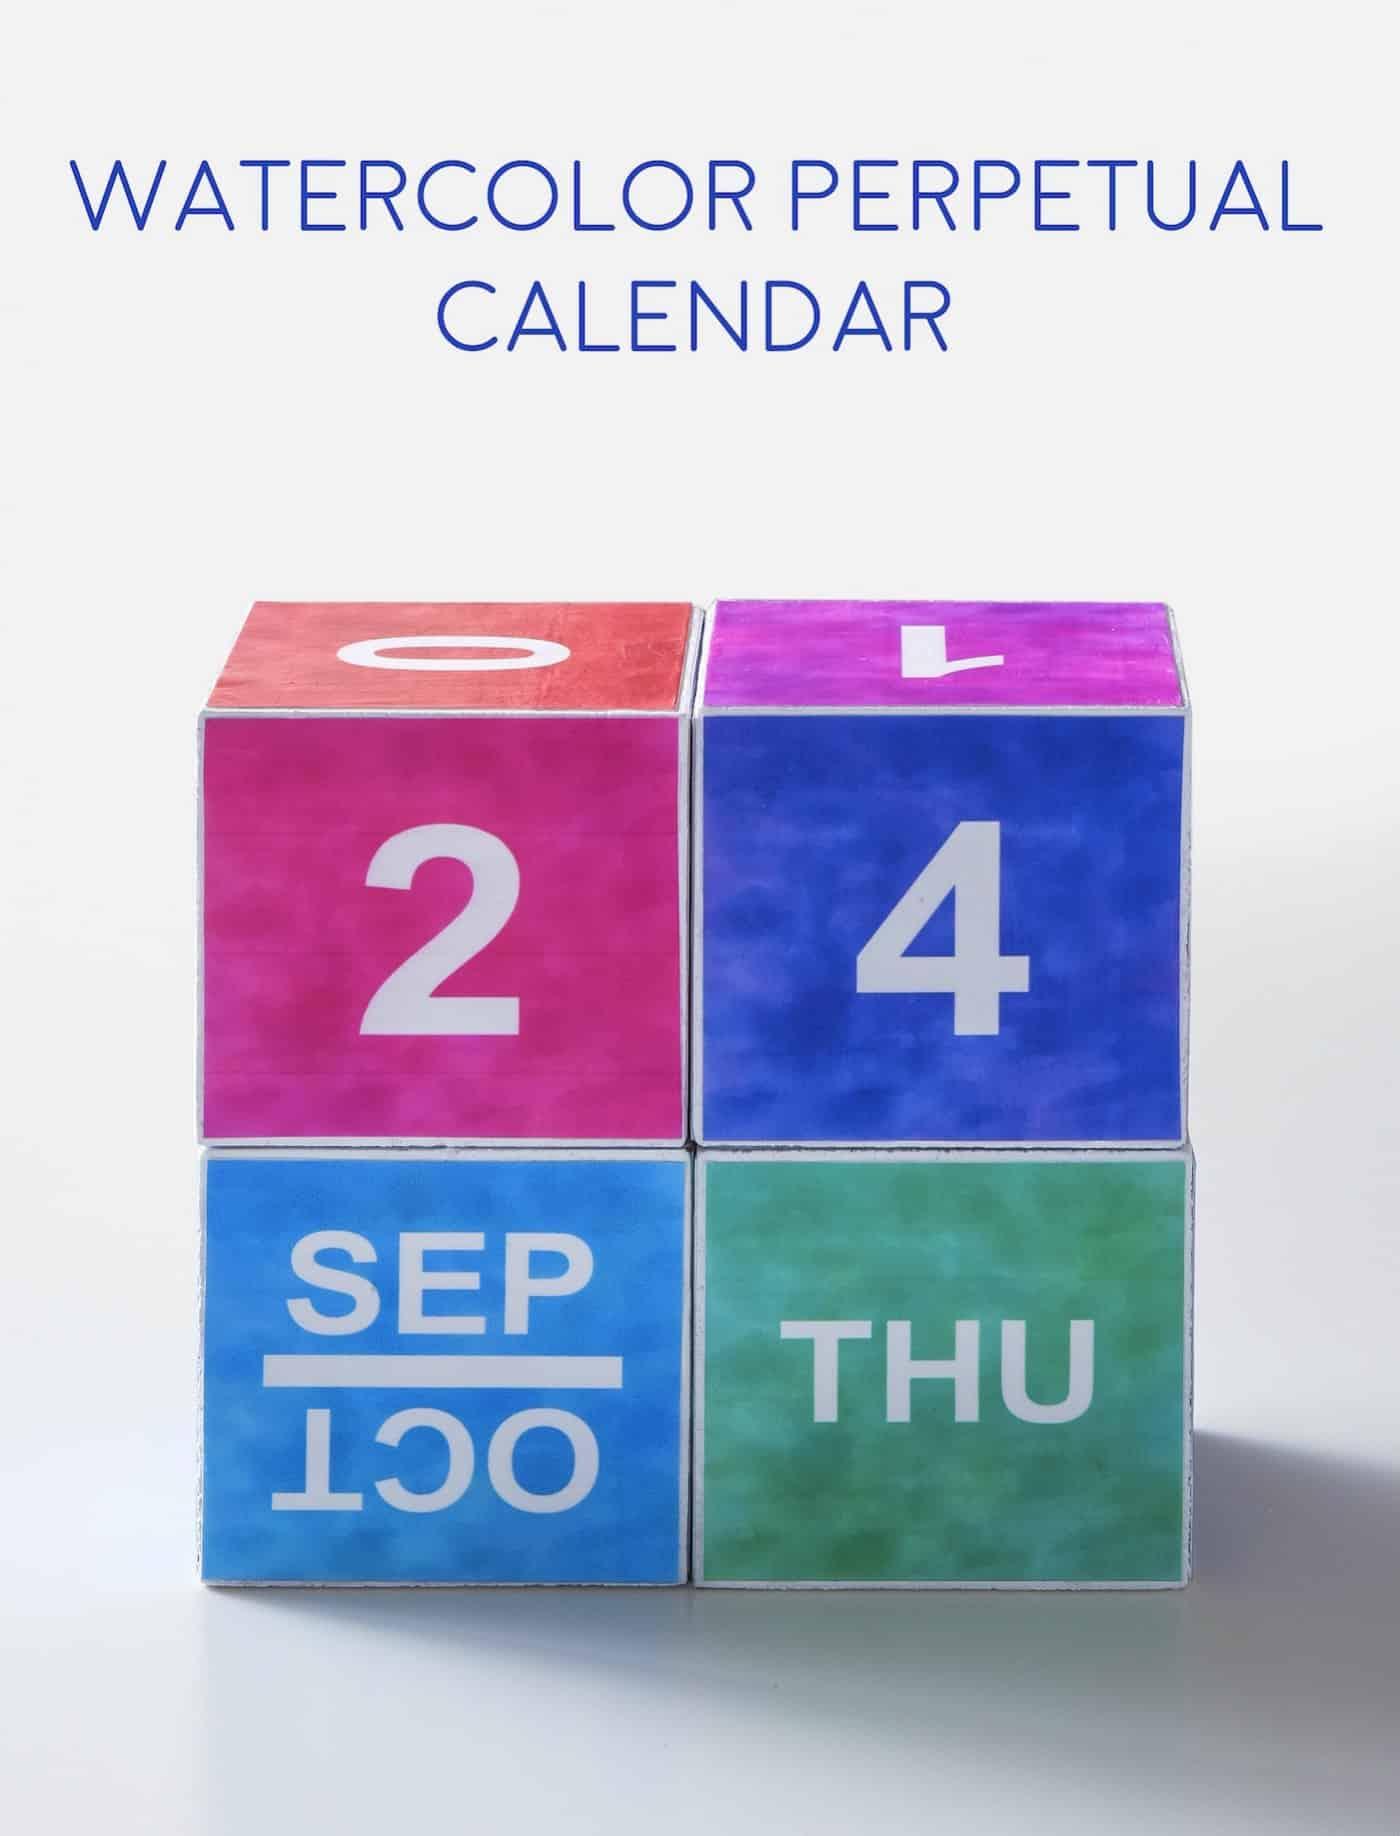 Watercolor Perpetual Calendar (With Free Printable) - Mod